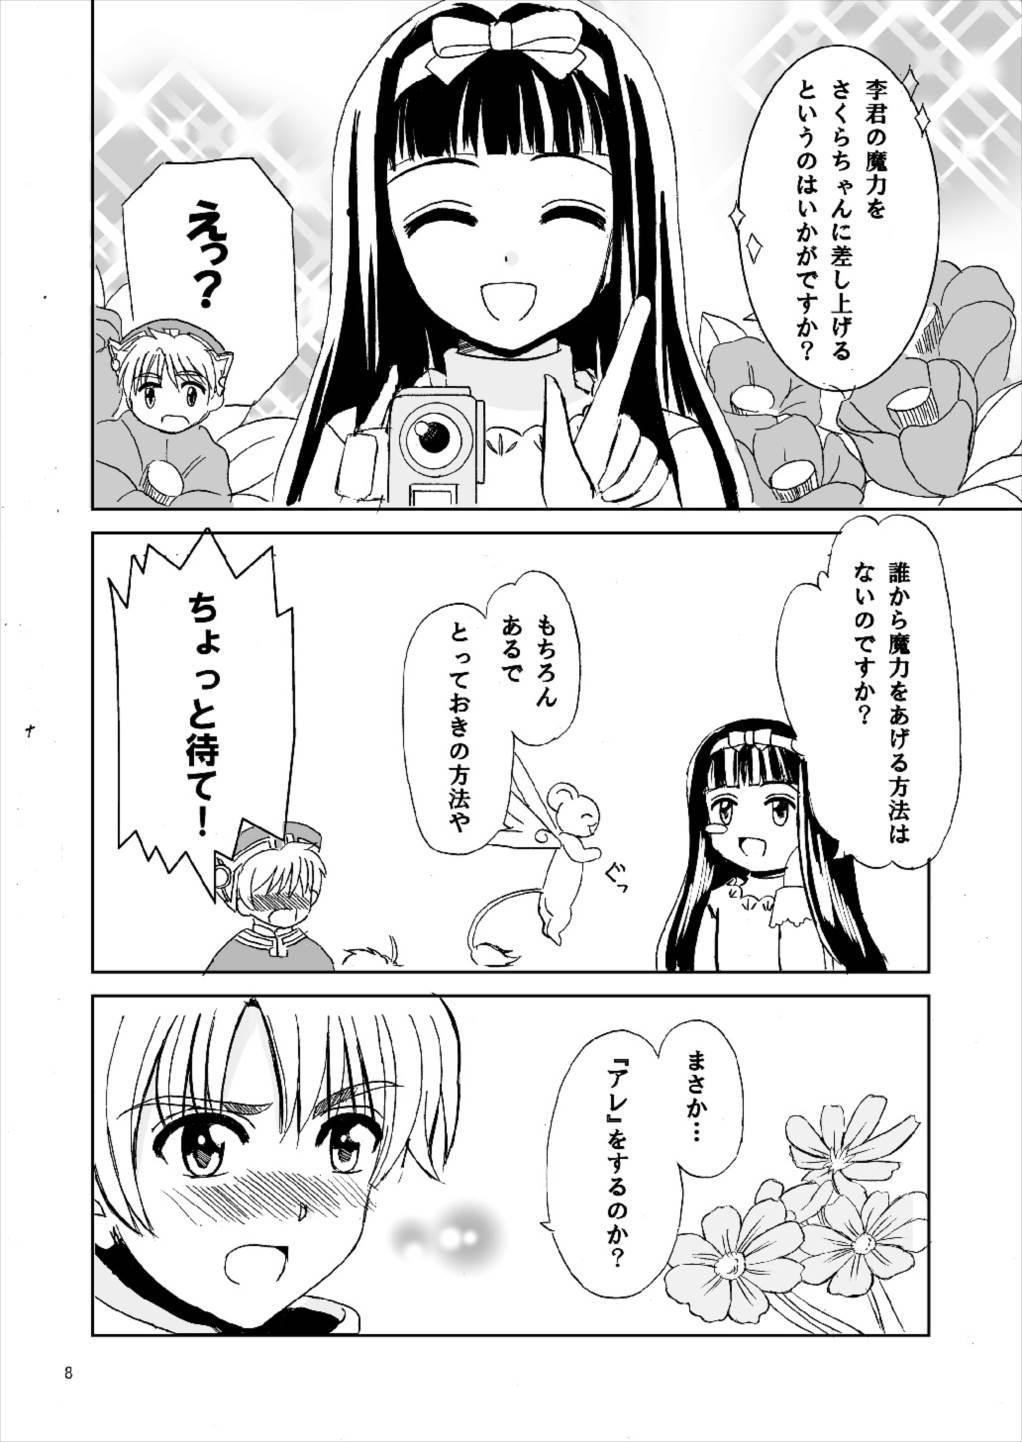 Sakura to Issho! 7